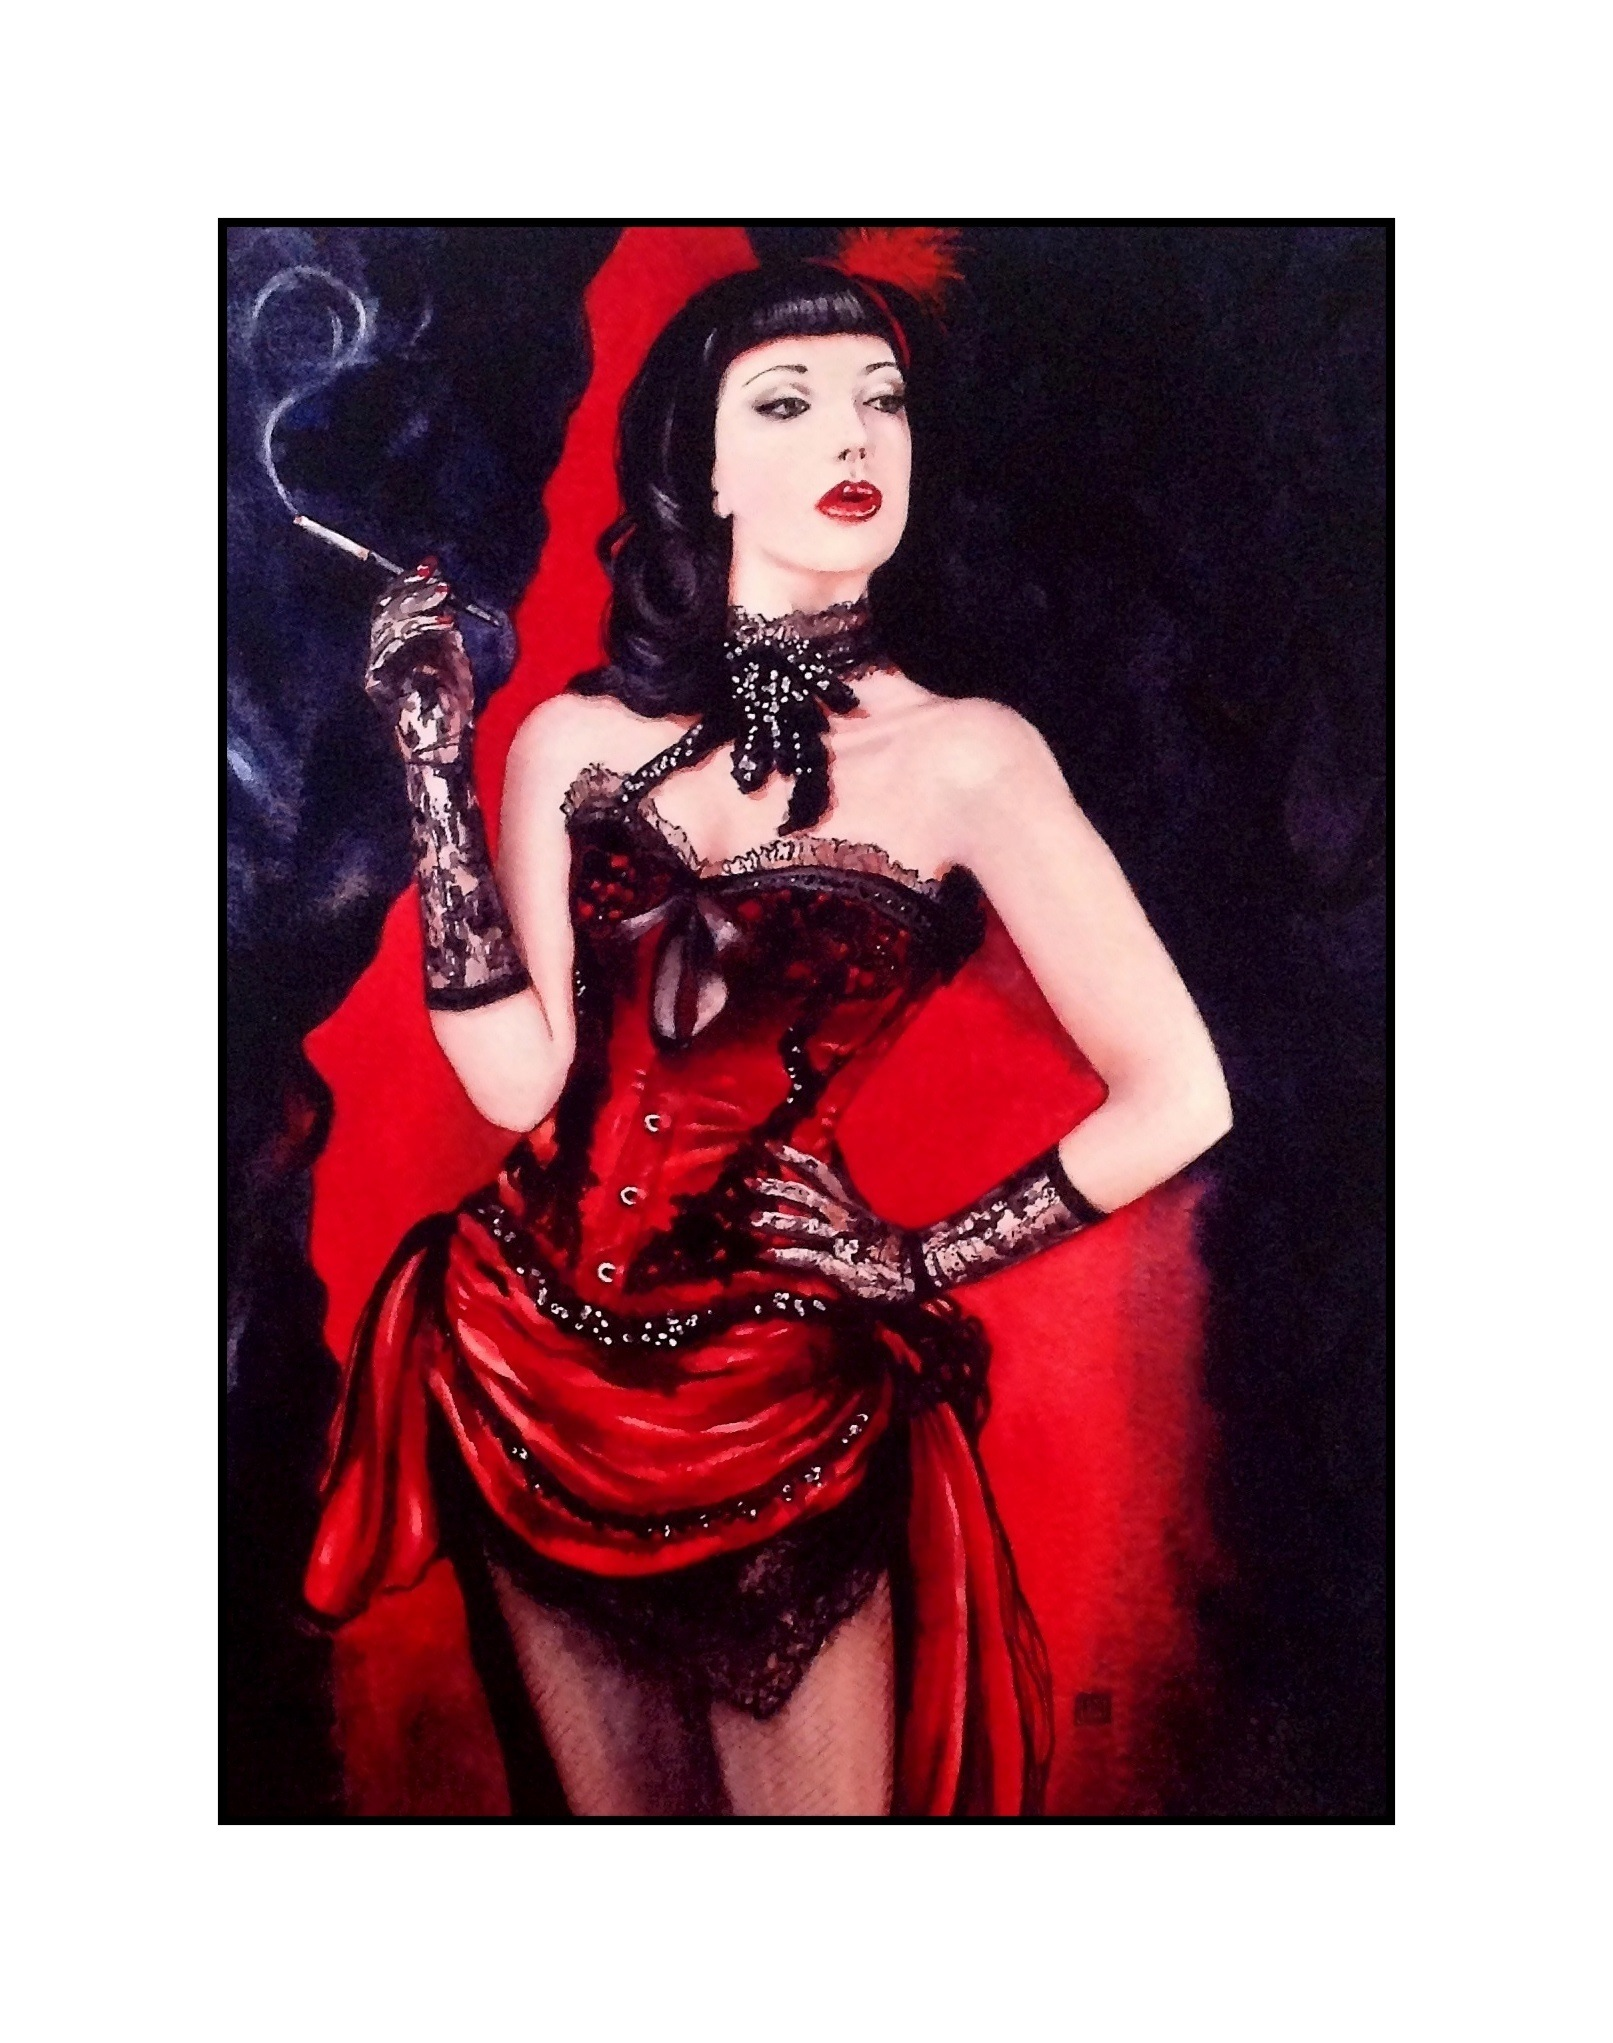 Burlesque £500 (Sold)